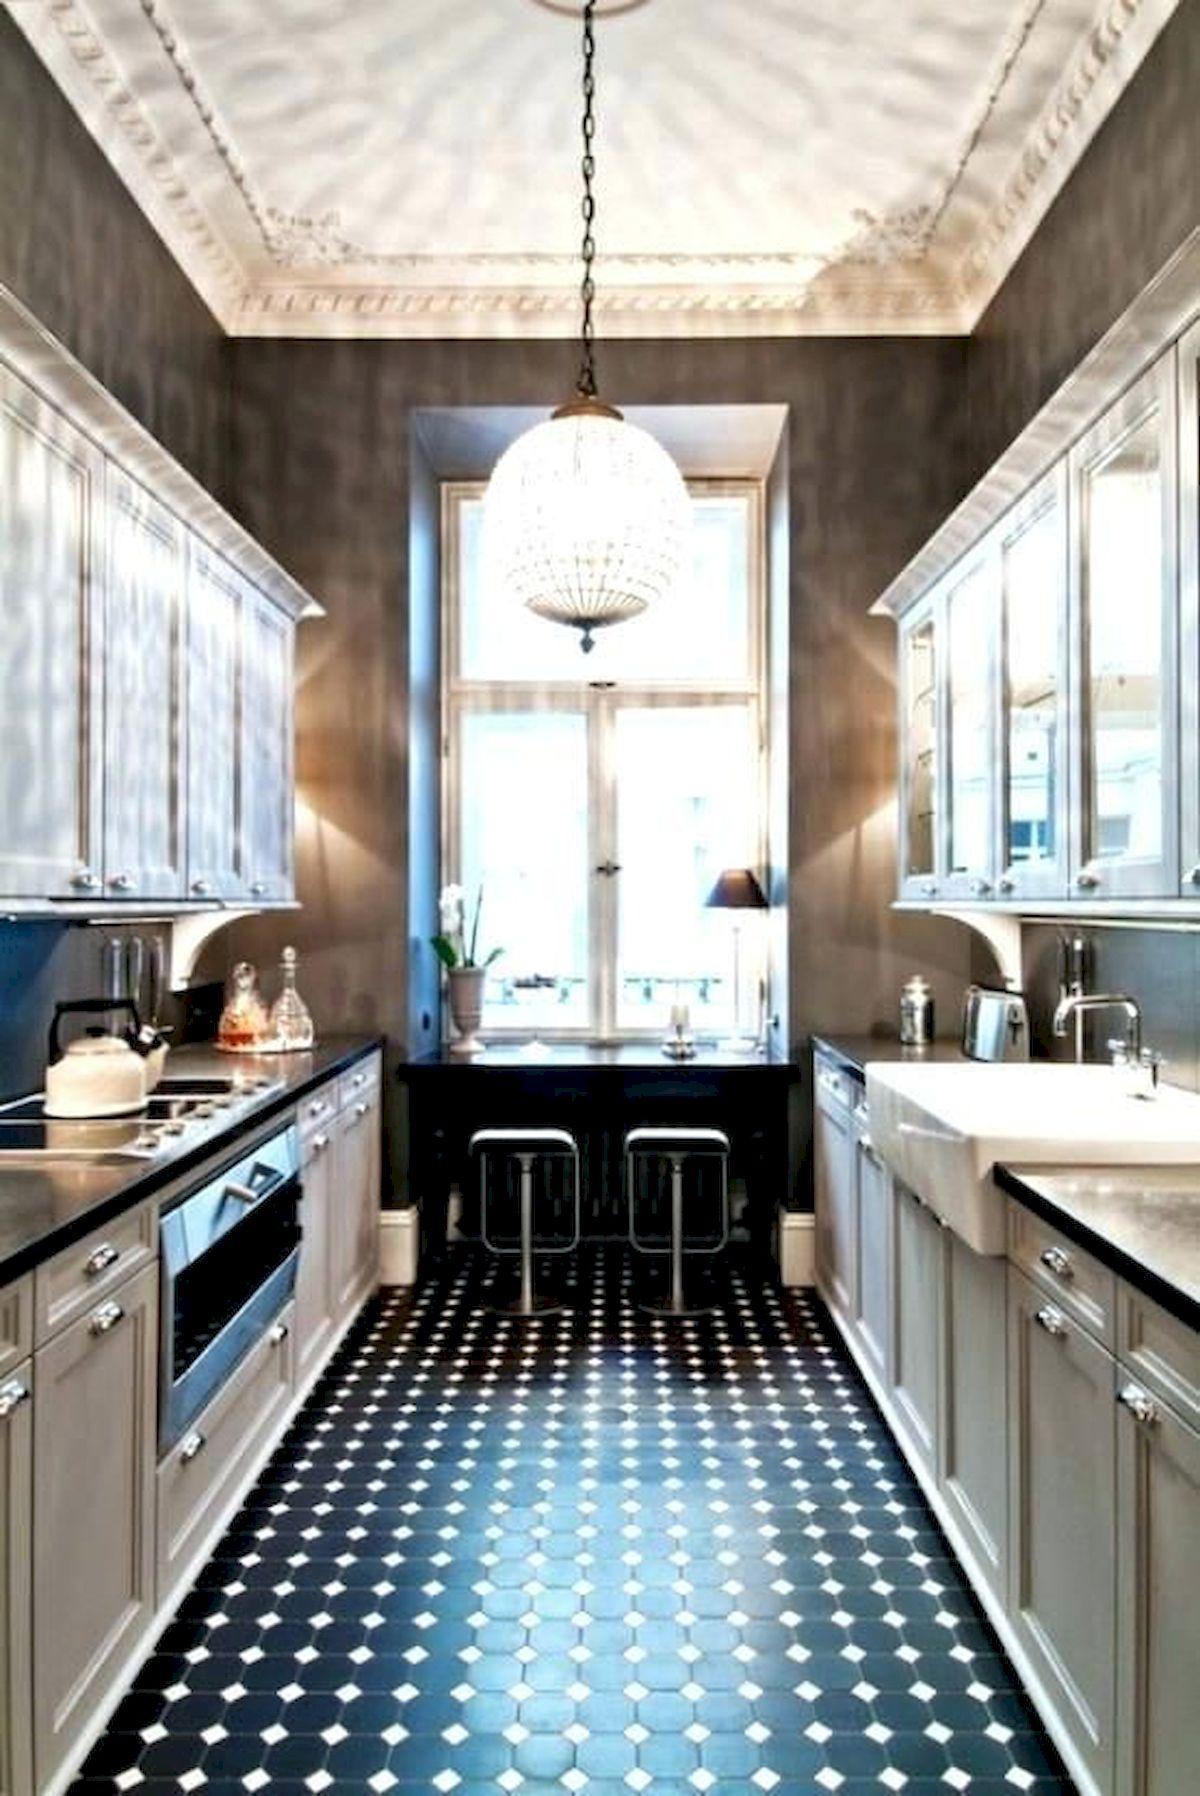 40 Best Tile Flooring Designs Ideas For Modern Kitchen (39)